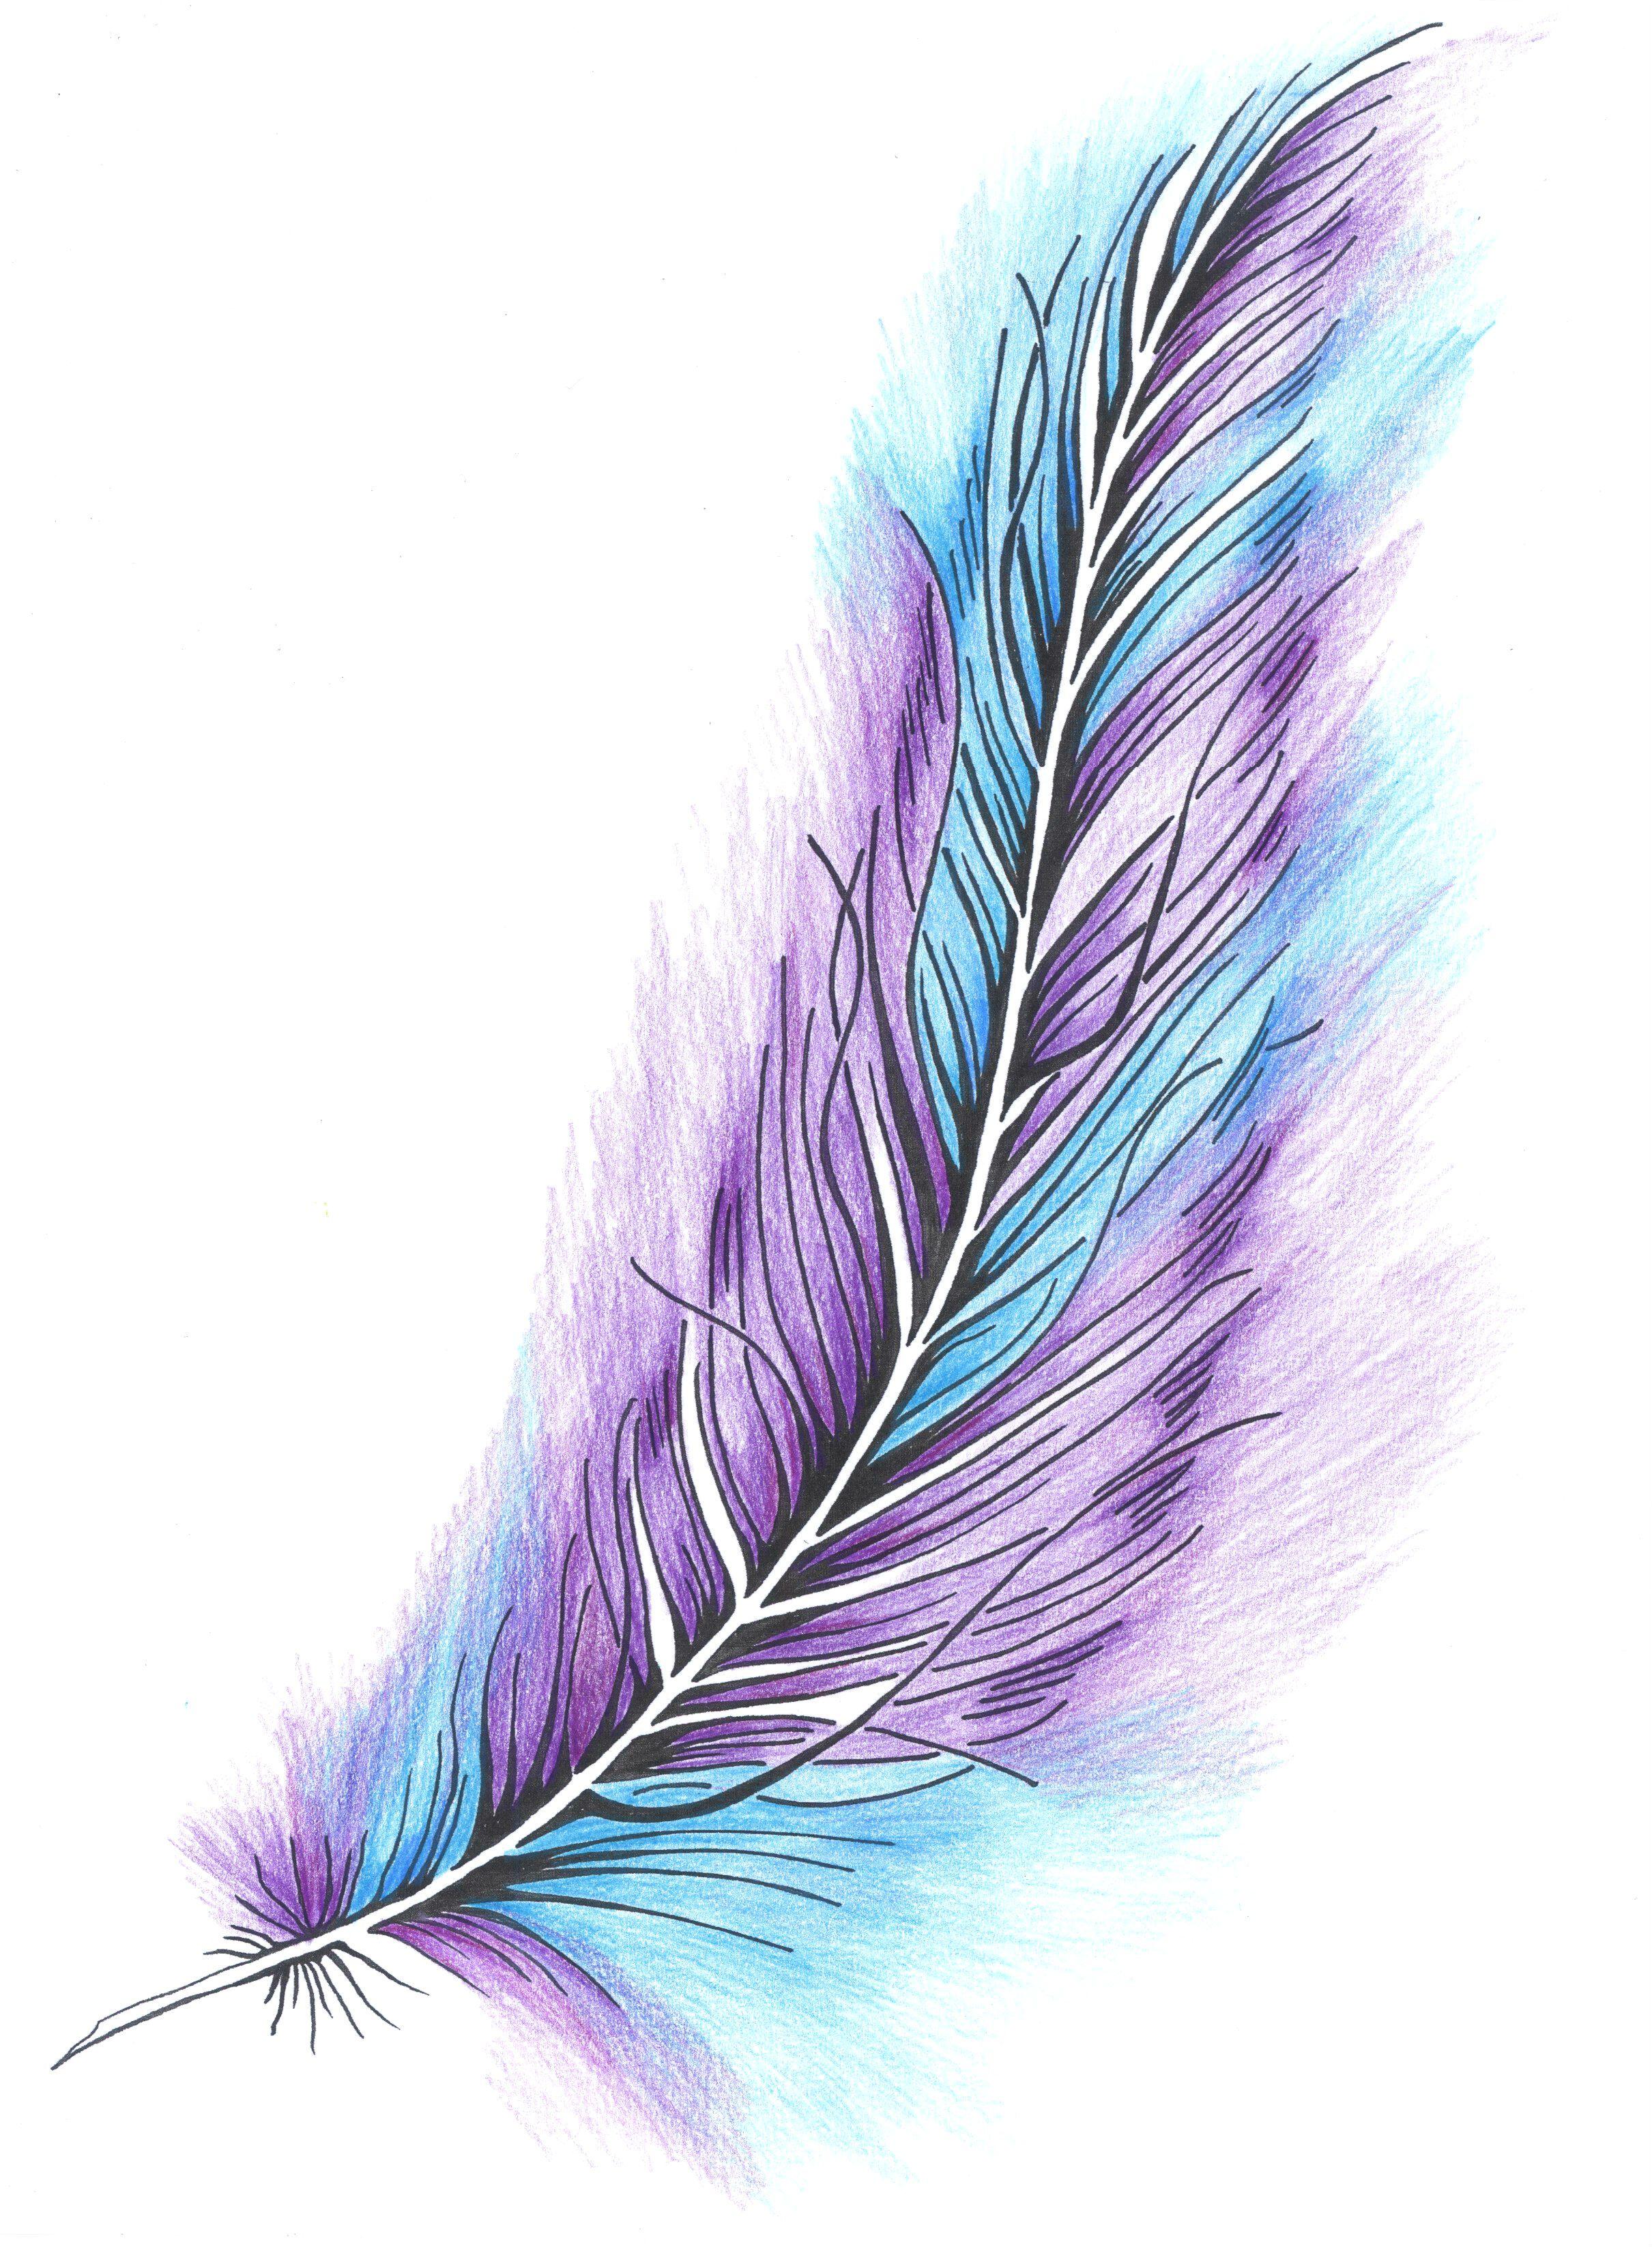 atrapasueos cepillos acuarela originales tatuajes de plumas plumas dibujar tatuajes mam